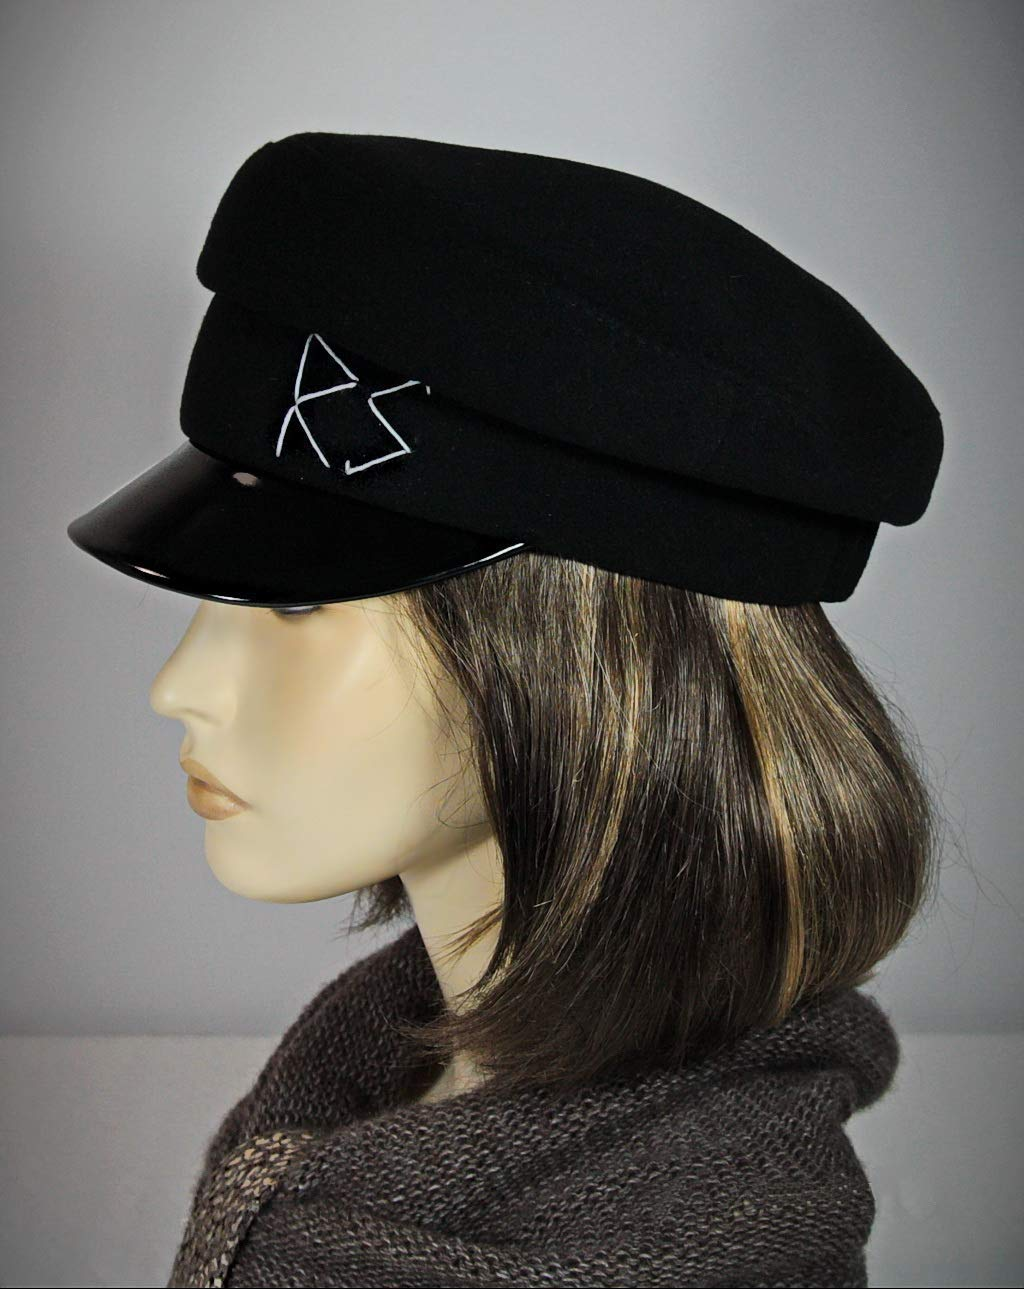 Breton Сap, Breton Hat, John Lennon Cap, Classic Breton Hat, Retro Cap, Baker Boy Cap, Captains Hat, Girls Baker Boy Hat, Ladies Baker Boy Hat,